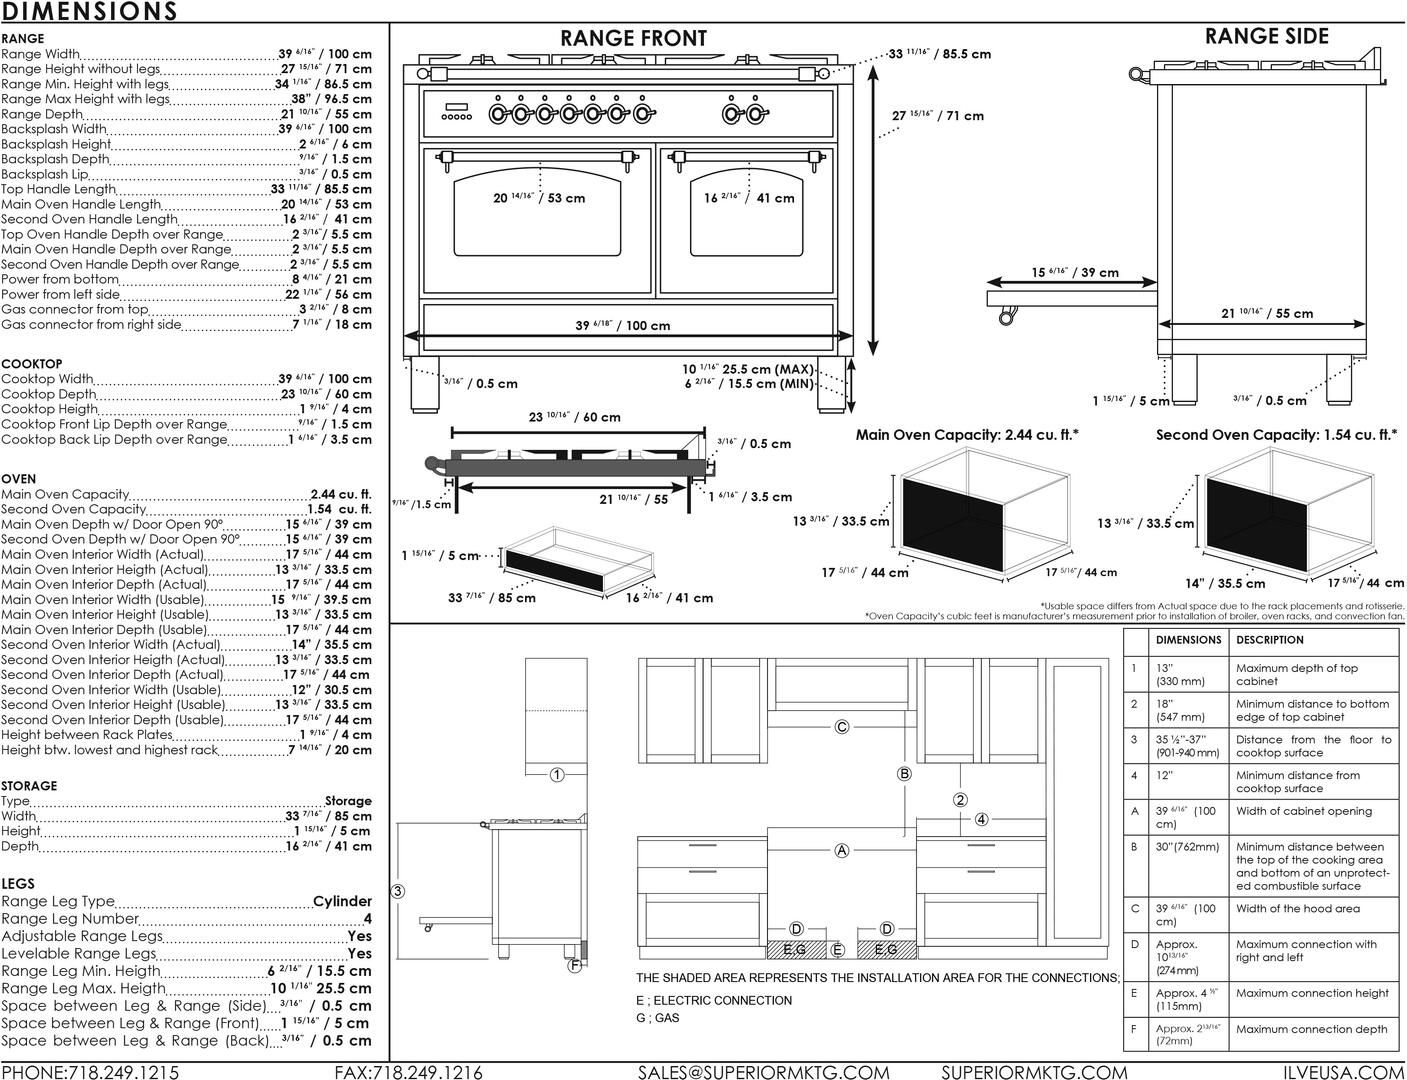 Ilve Nostalgie UPDN100FDMPNLP Freestanding Dual Fuel Range Black, UPDN100FDM Dimensions Guide